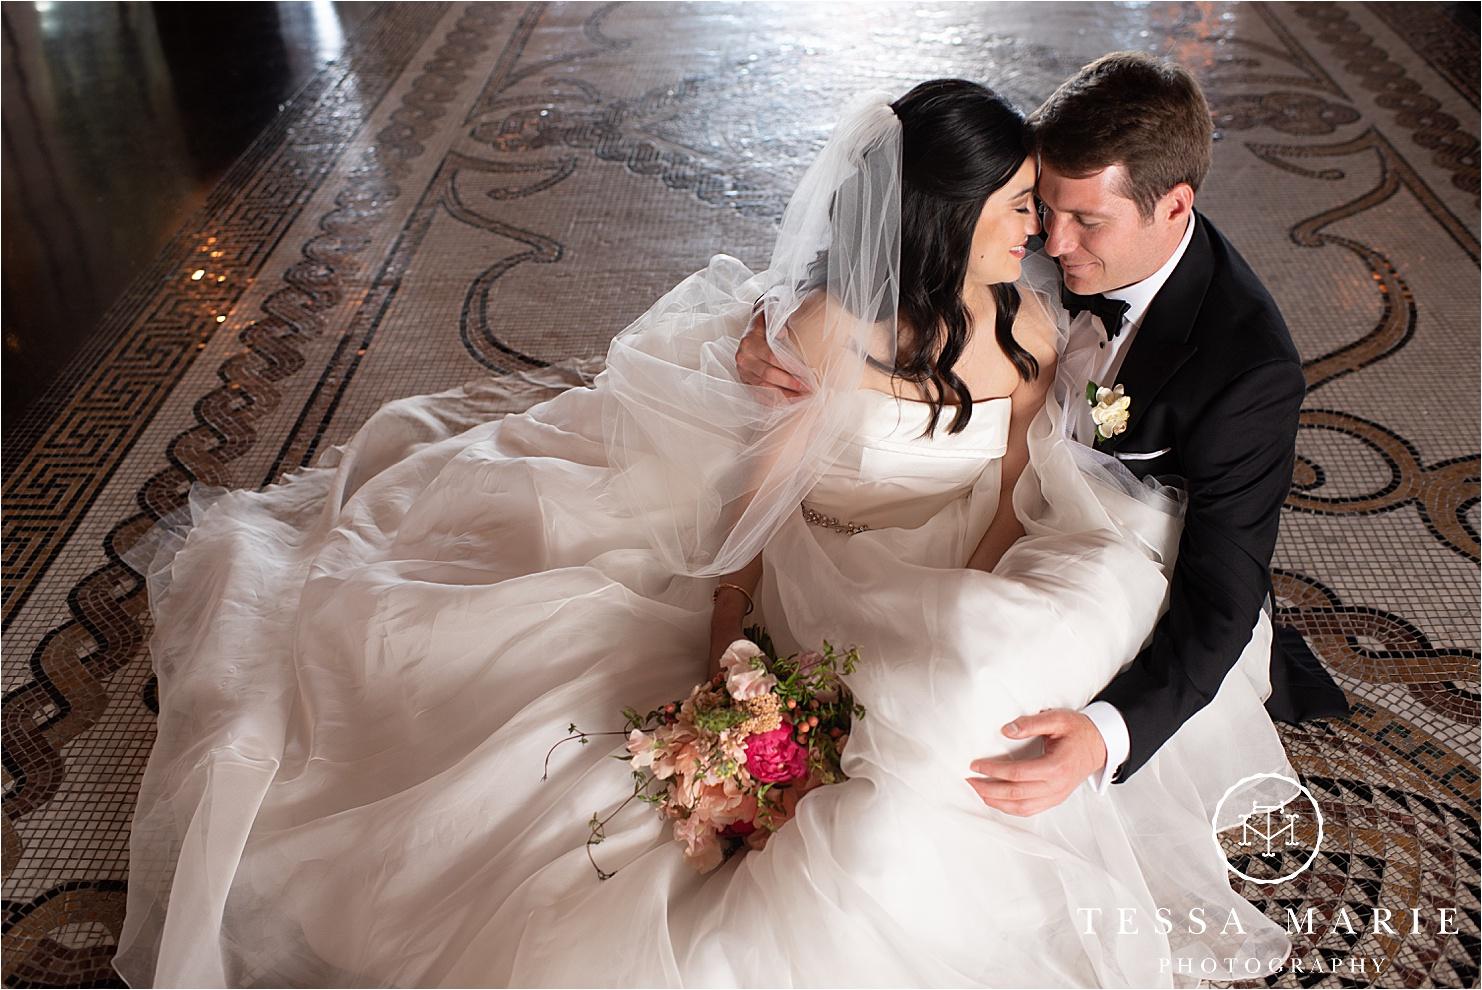 Tessa_marie_weddings_houston_wedding_photographer_The_astorian_0072.jpg